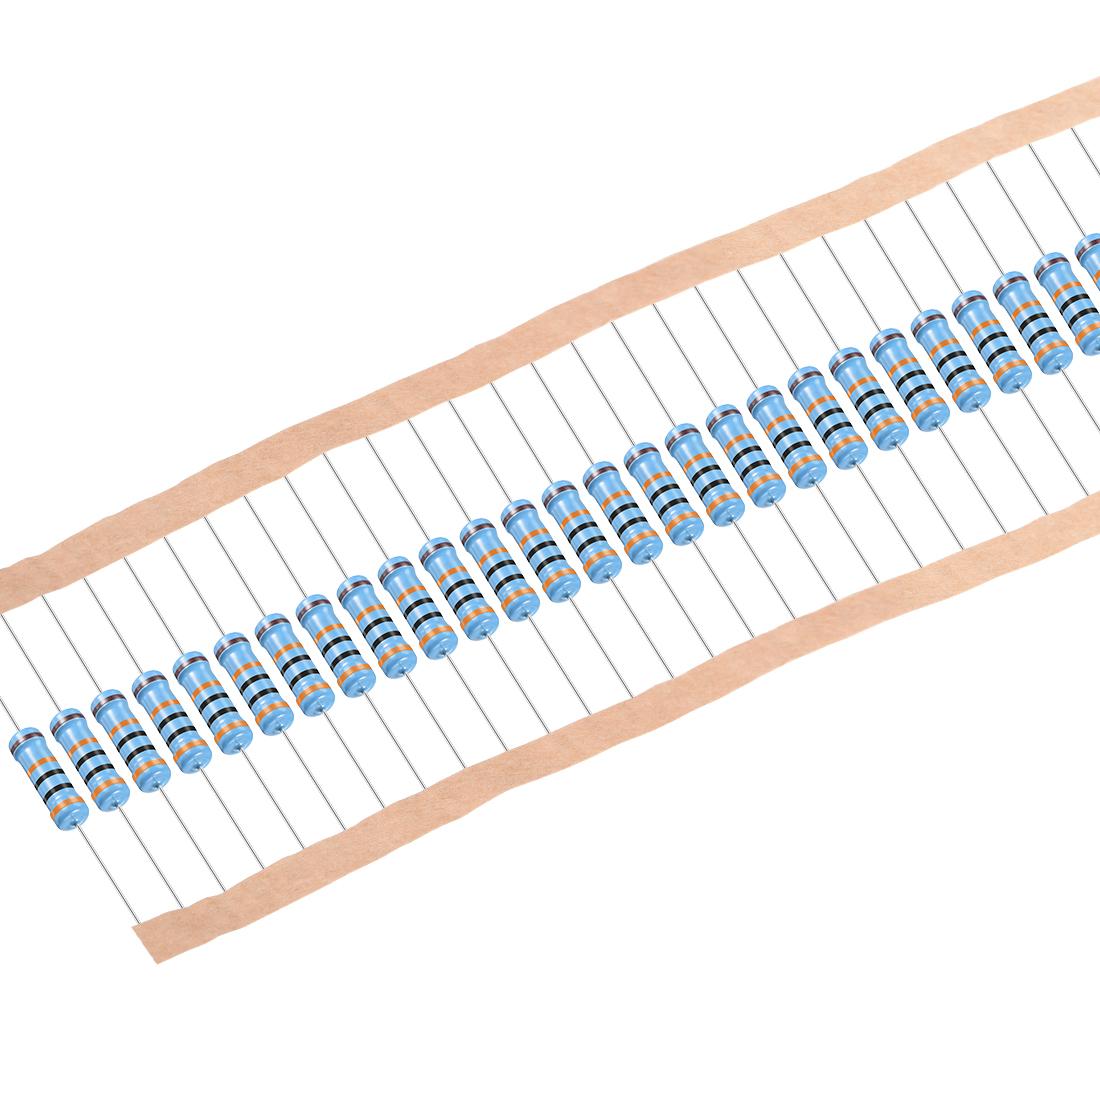 Metal Film Resistors 300k Ohm 1W 1% Tolerances 5 Color Bands Pack of 200 - image 4 of 4